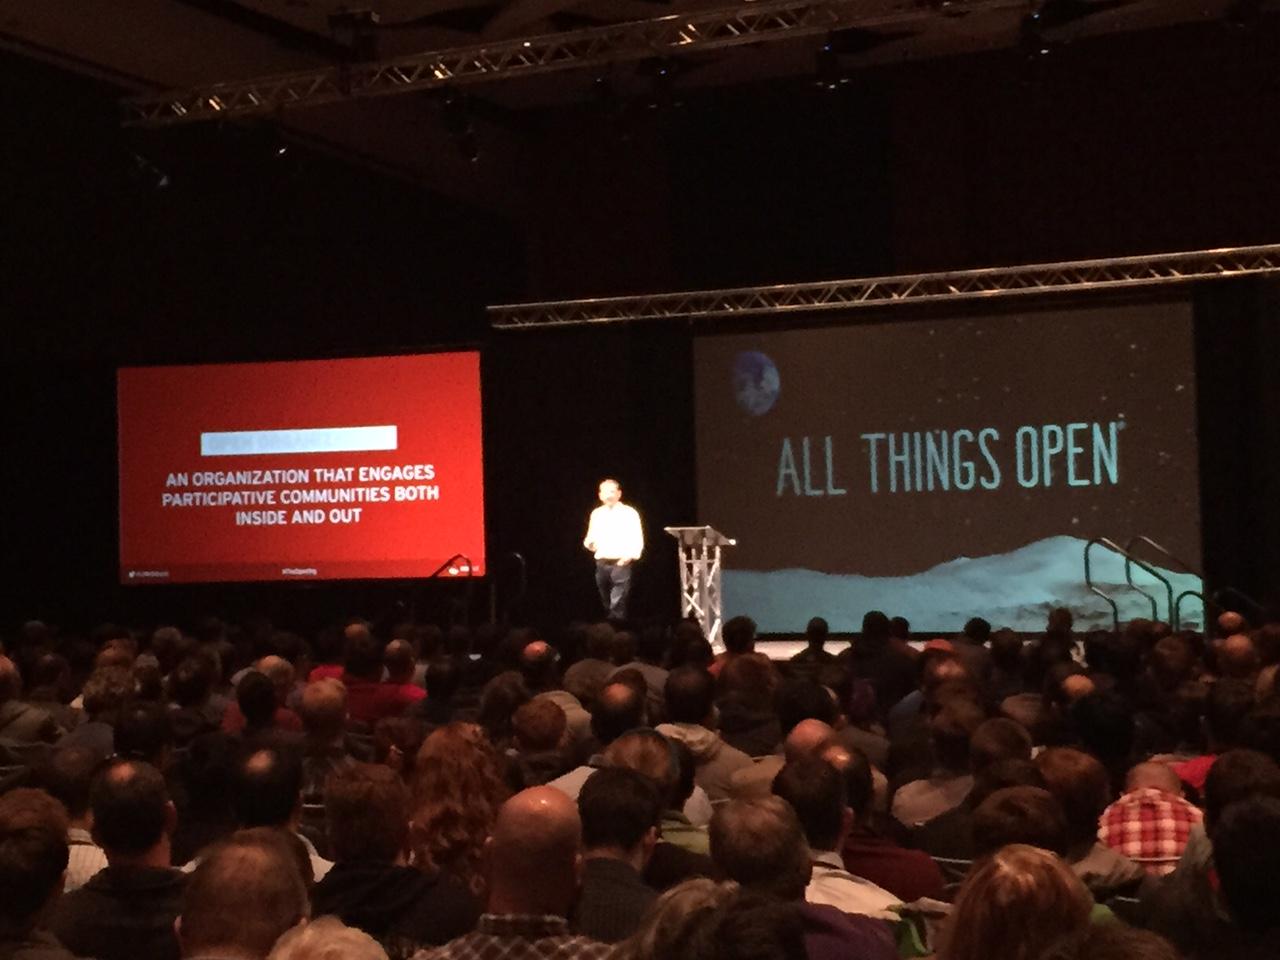 JIM WHITEHURST,  PRESIDENT & CEO, RED HAT ALL THINGS OPEN 2015